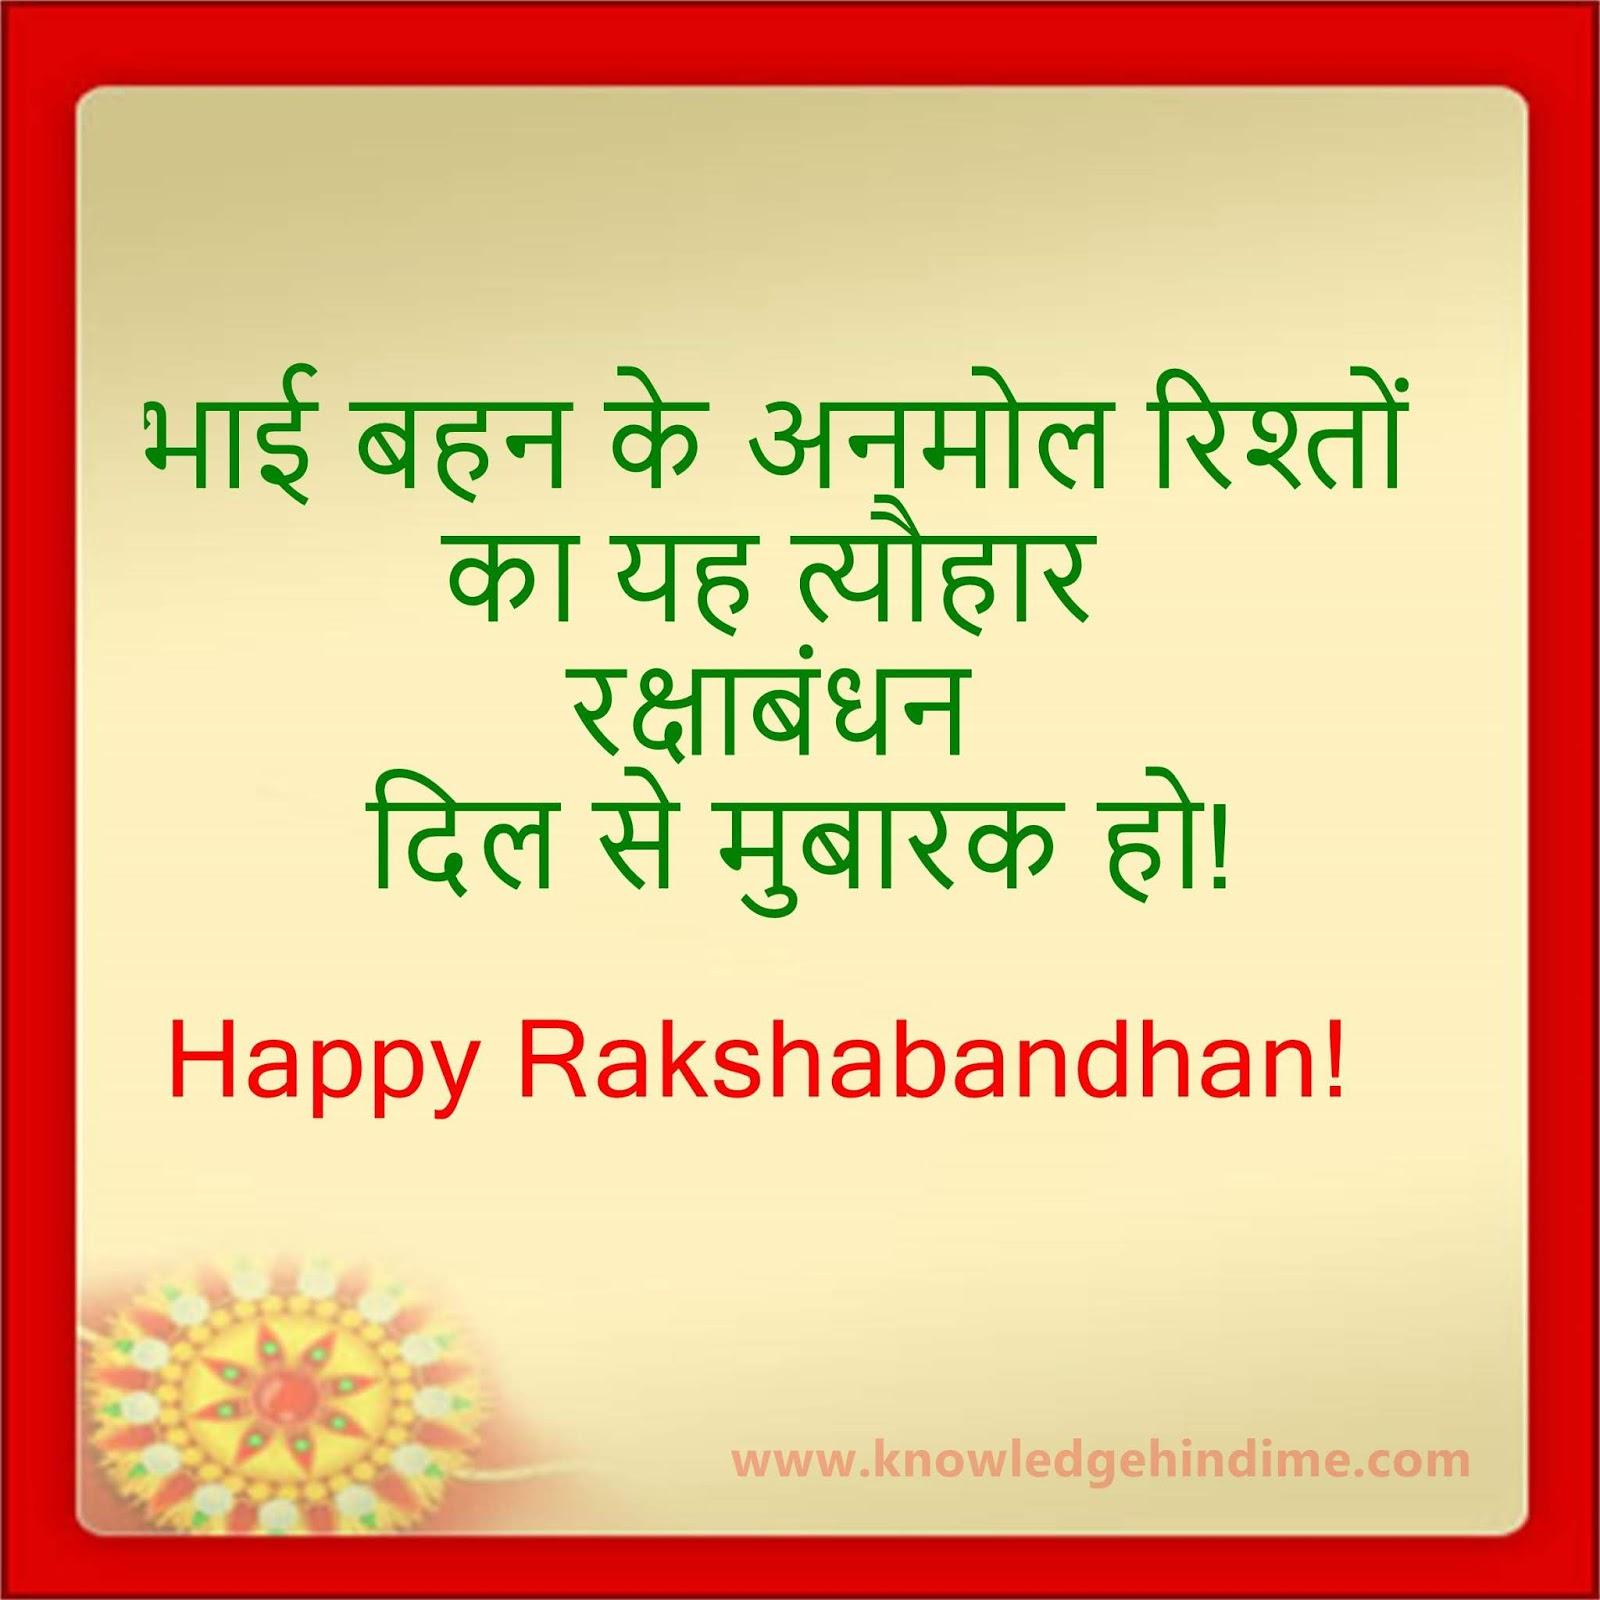 Raksha Bandhan Images, Photo, HD Wallpaper 2018  Download